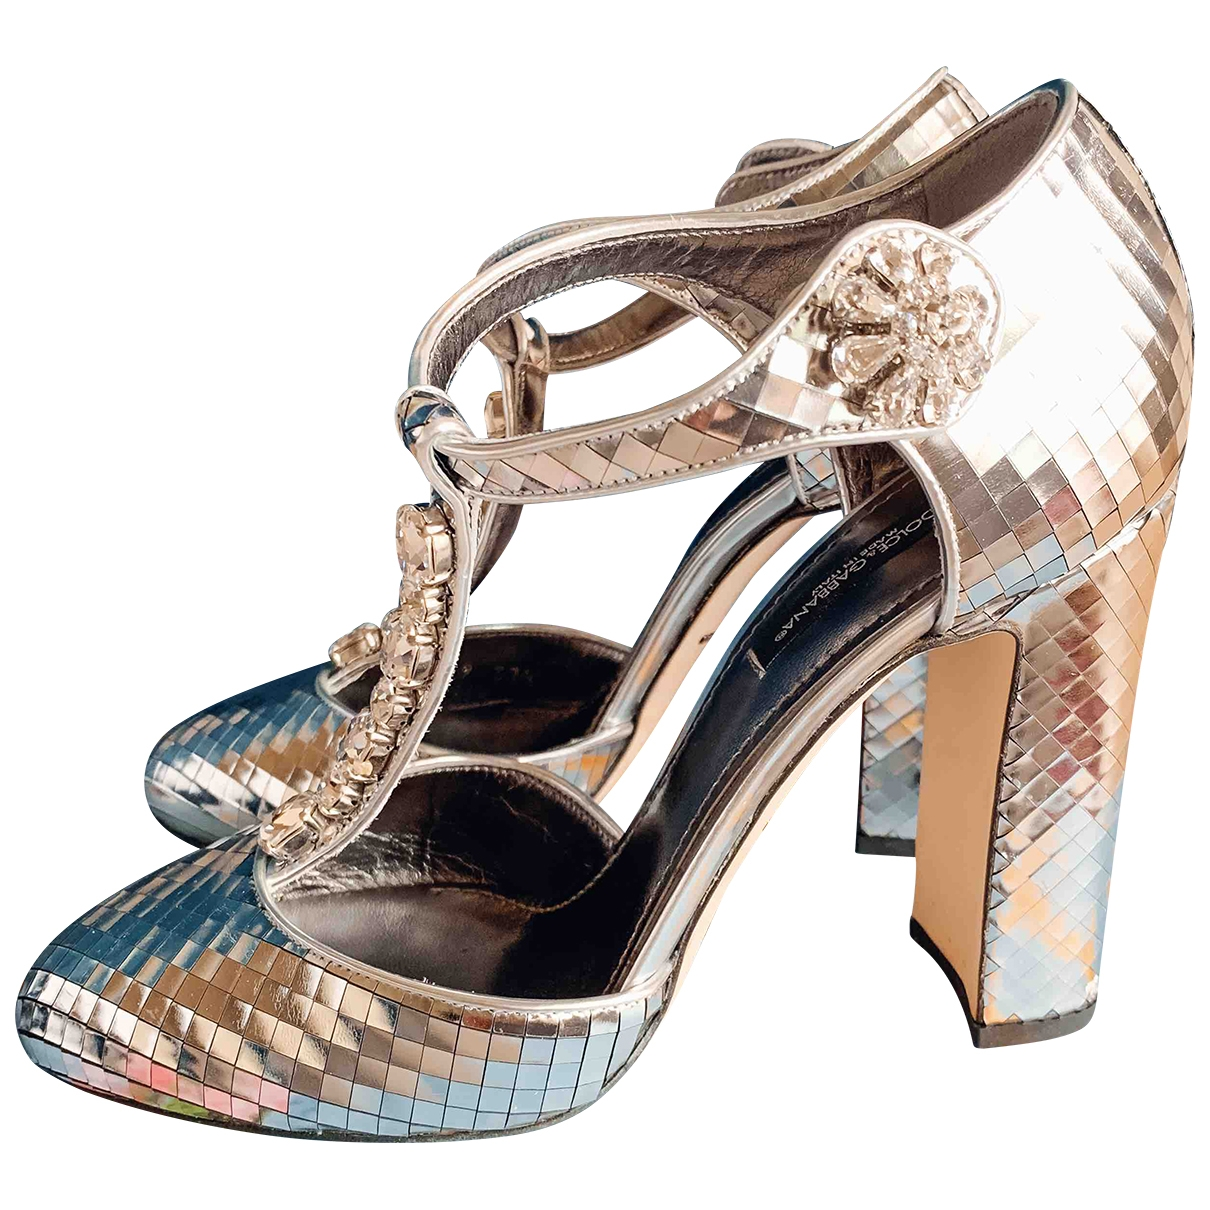 Dolce & Gabbana \N Pumps in  Silber Polyester